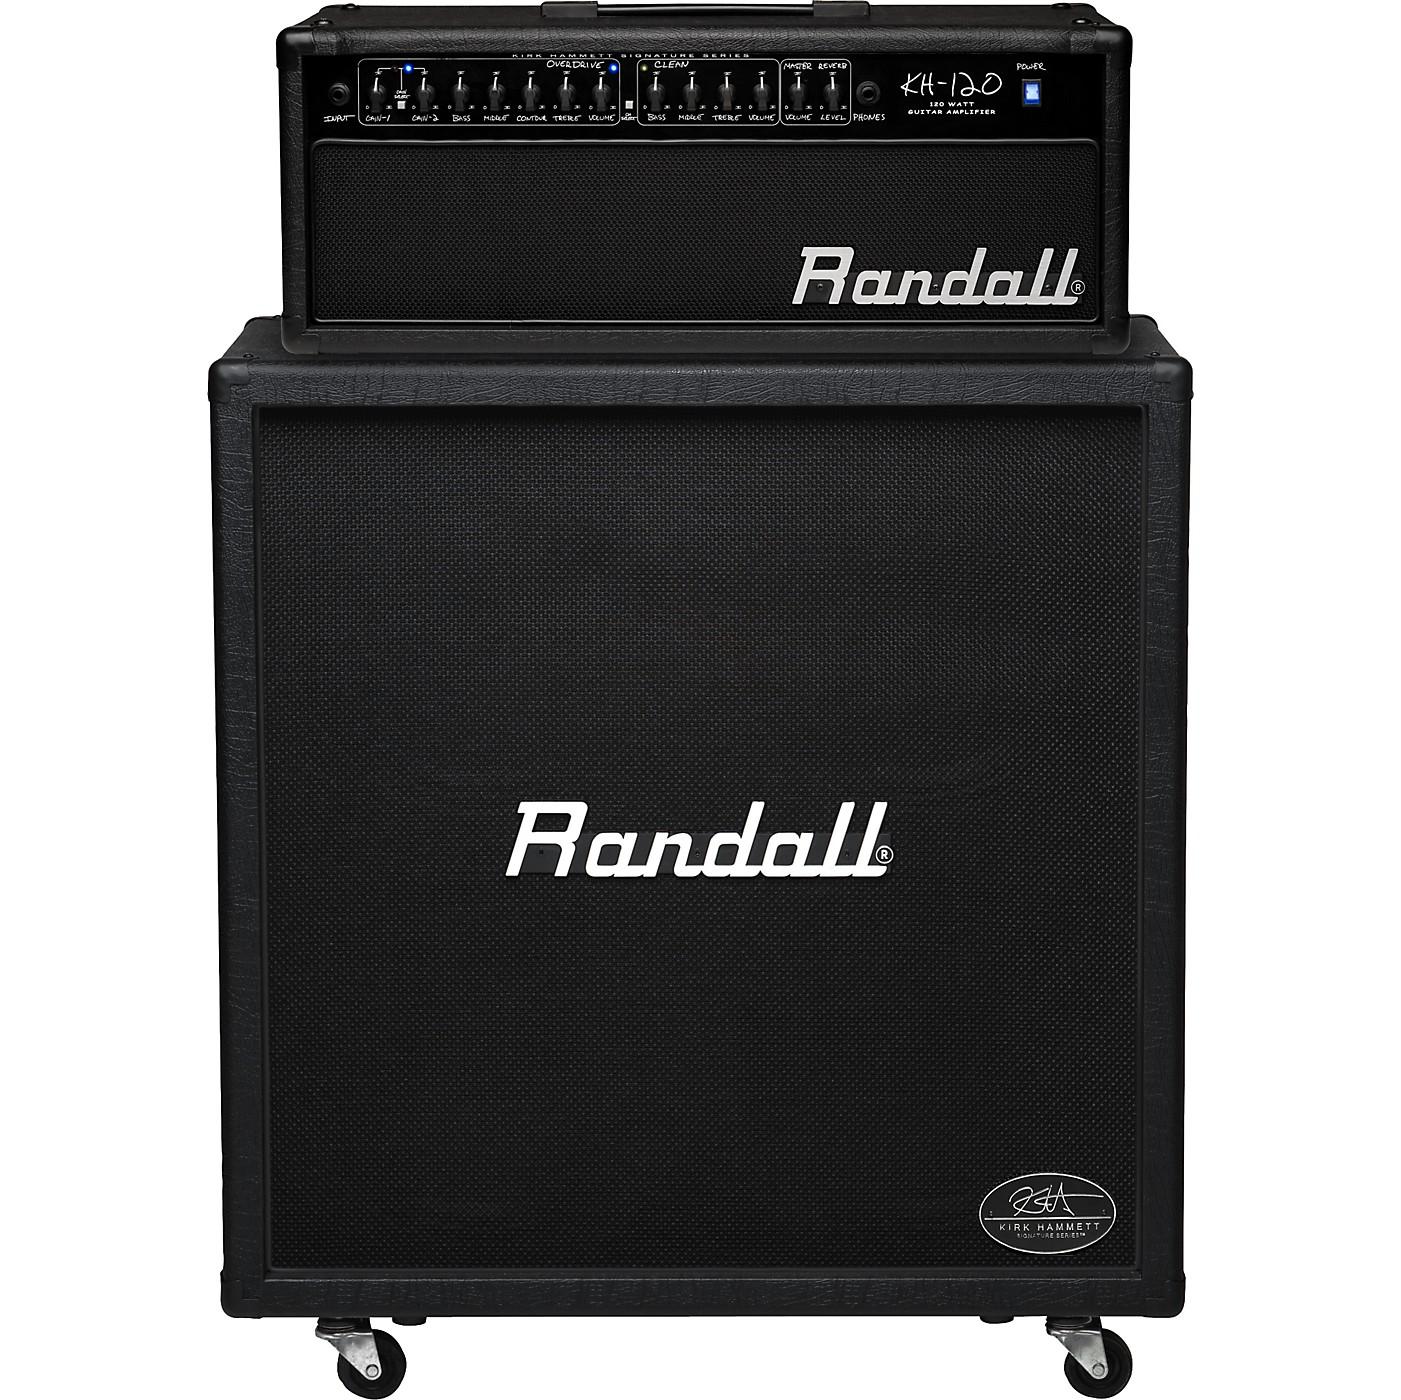 Randall Kirk Hammett Signature Series KH120RHS 120W 4x12 Guitar Half Stack thumbnail